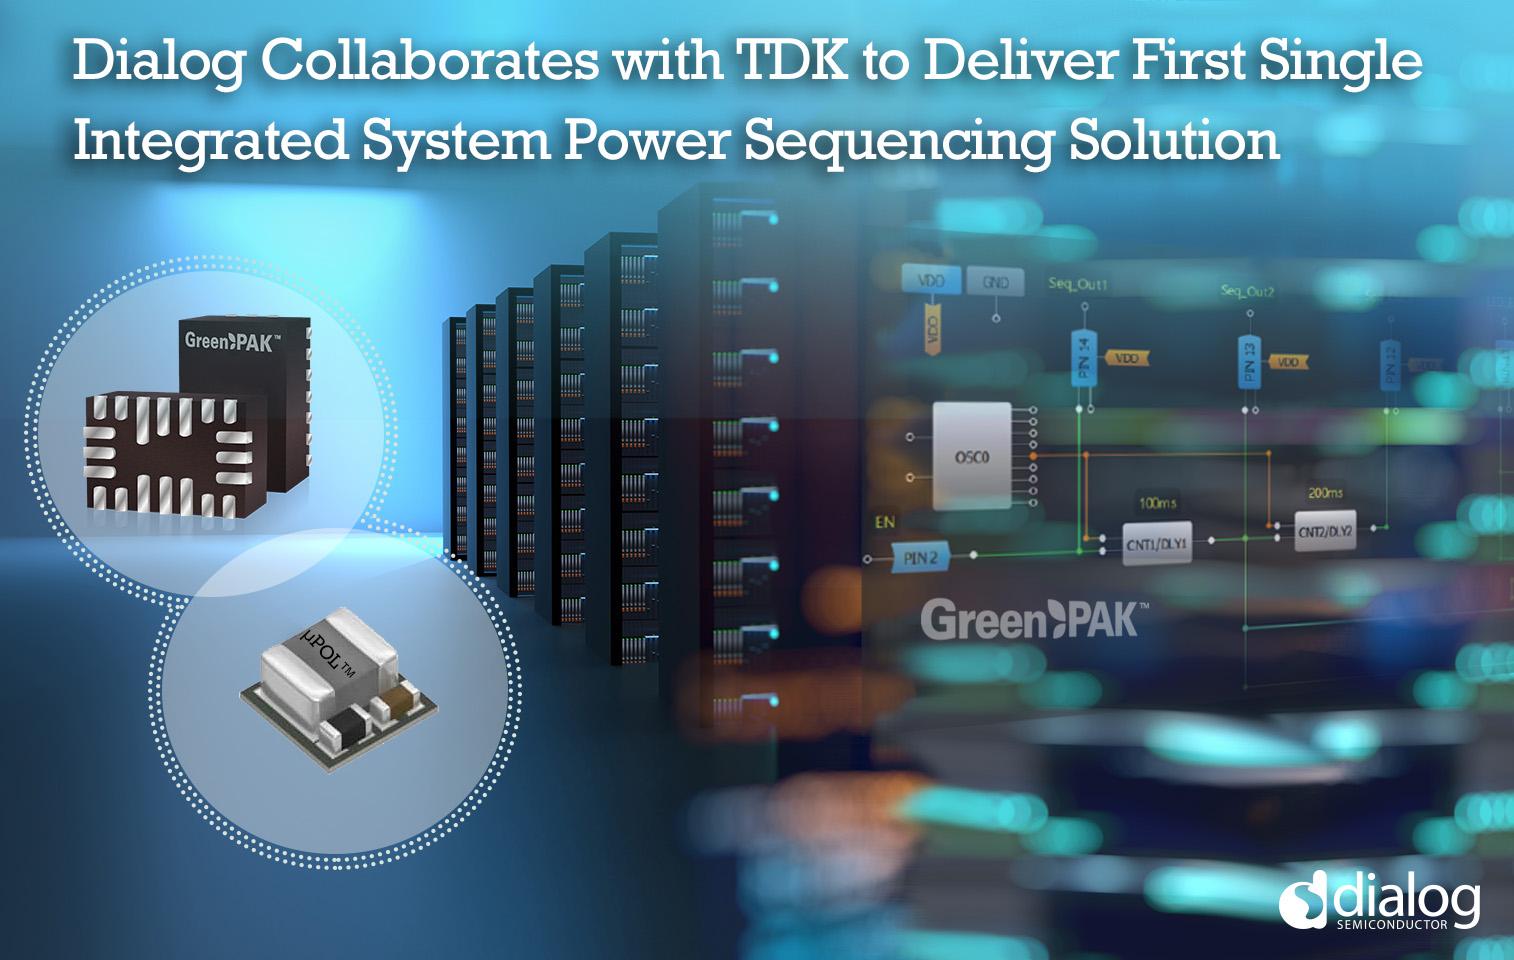 Dialog和TDK联合打造全球尺寸最小的负载点DC-DC转换器解决方案